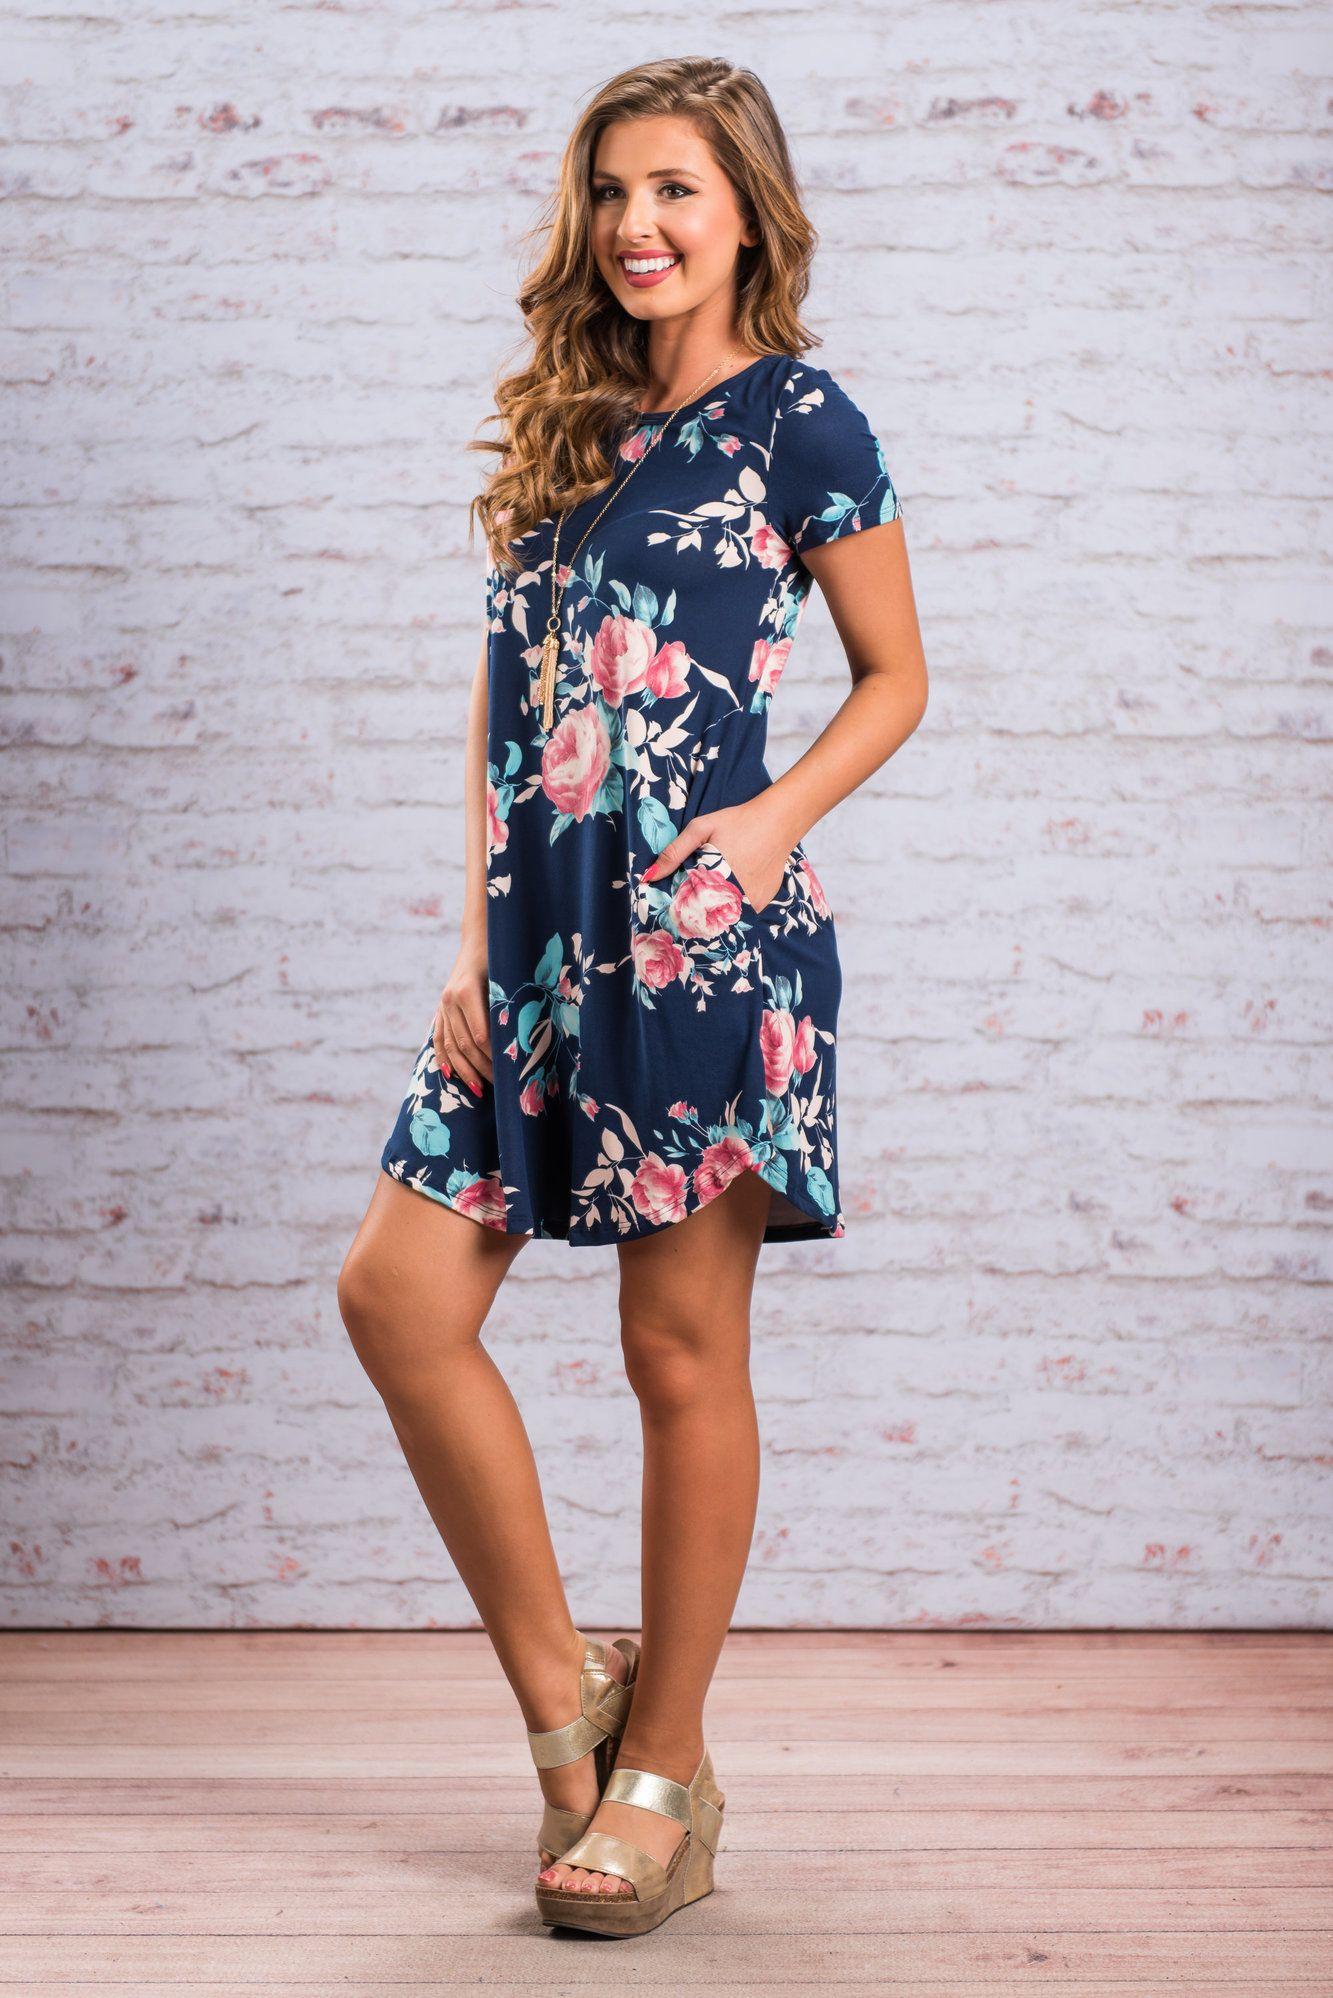 3134ea1ae7f4 Navy Blue Pocket Design Short Sleeve Summer Floral Shirt Dress ...